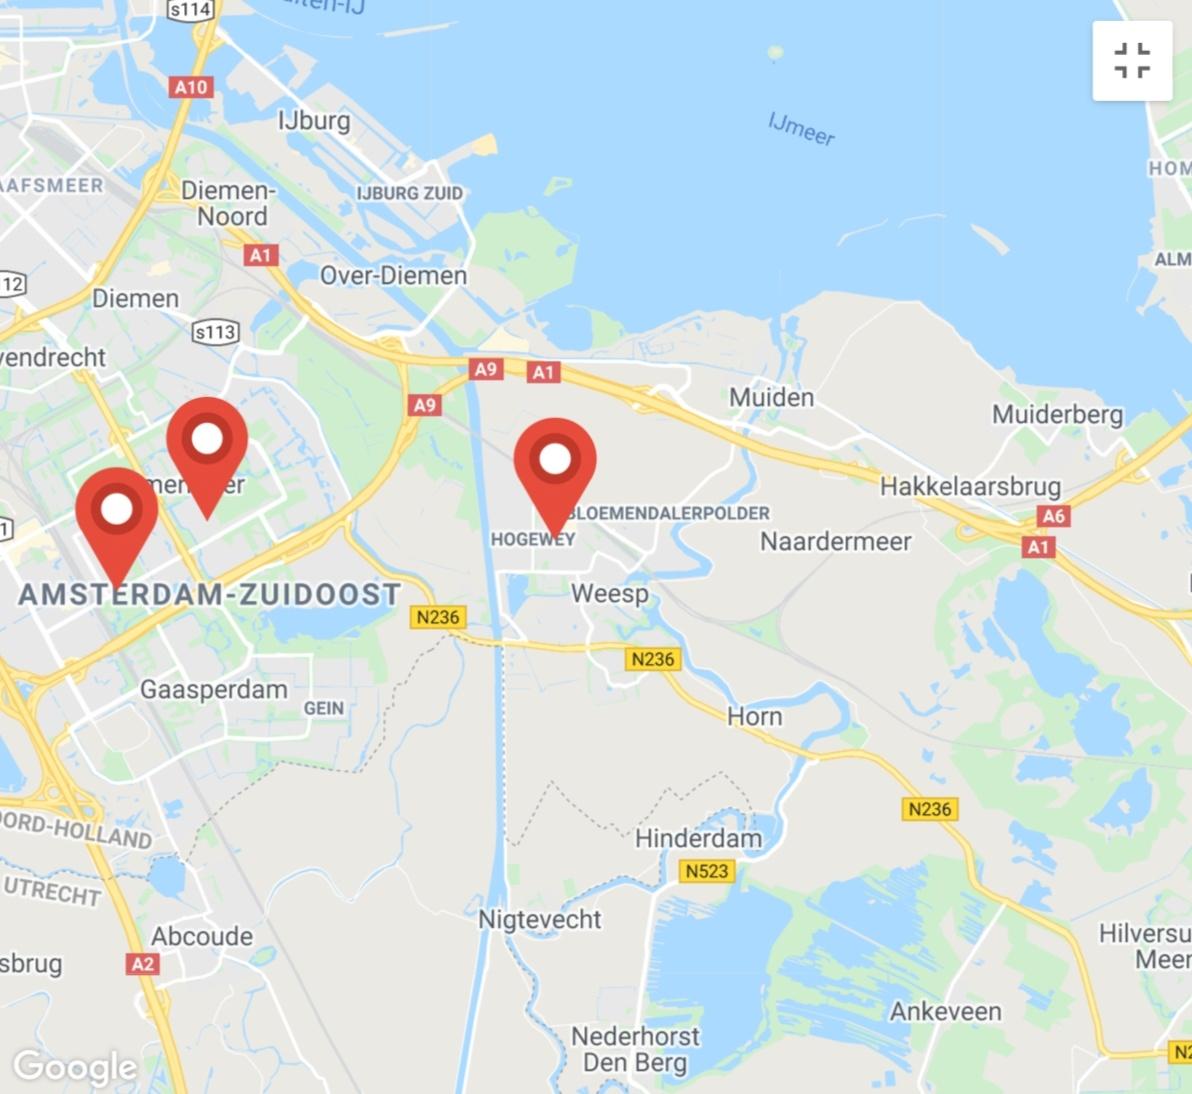 Kaart coronatest-weesp.com - Coronatest locaties Amsterdam